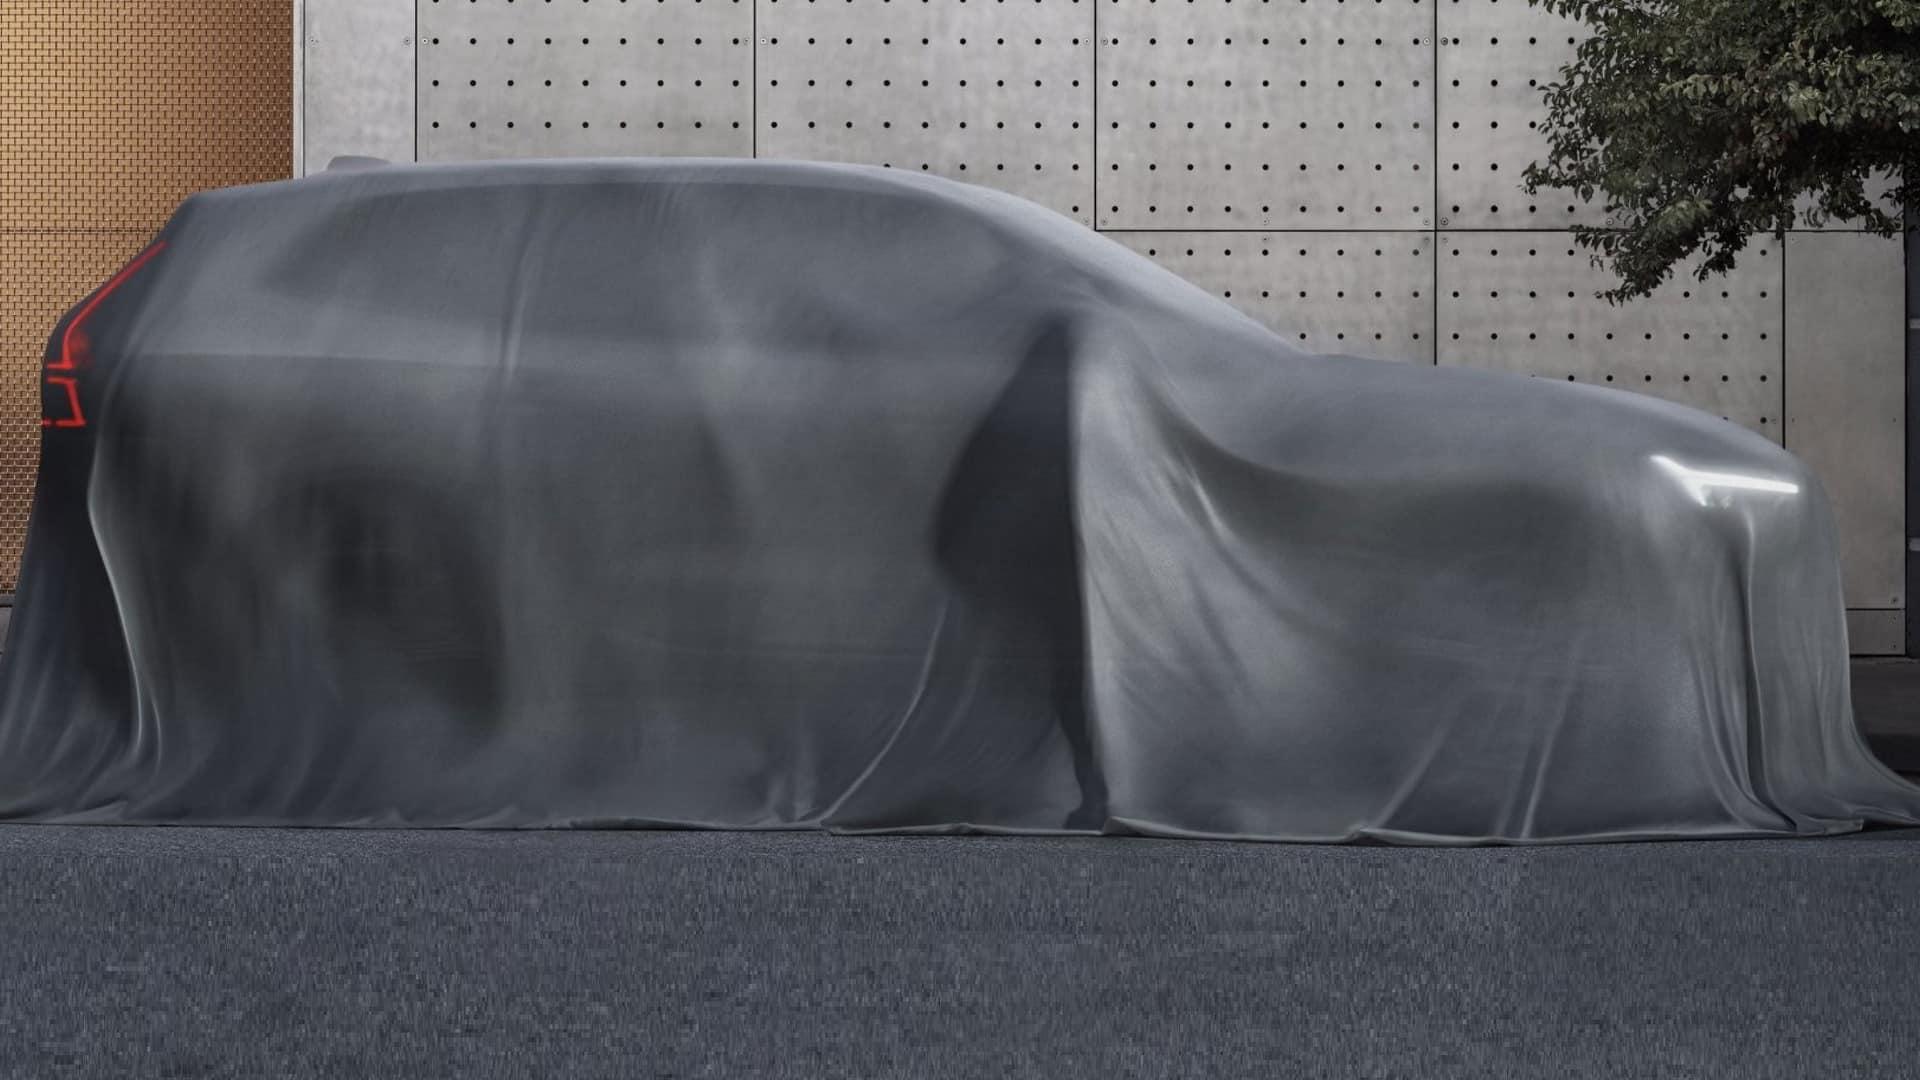 Volvo XC60 2018 teaser (1)